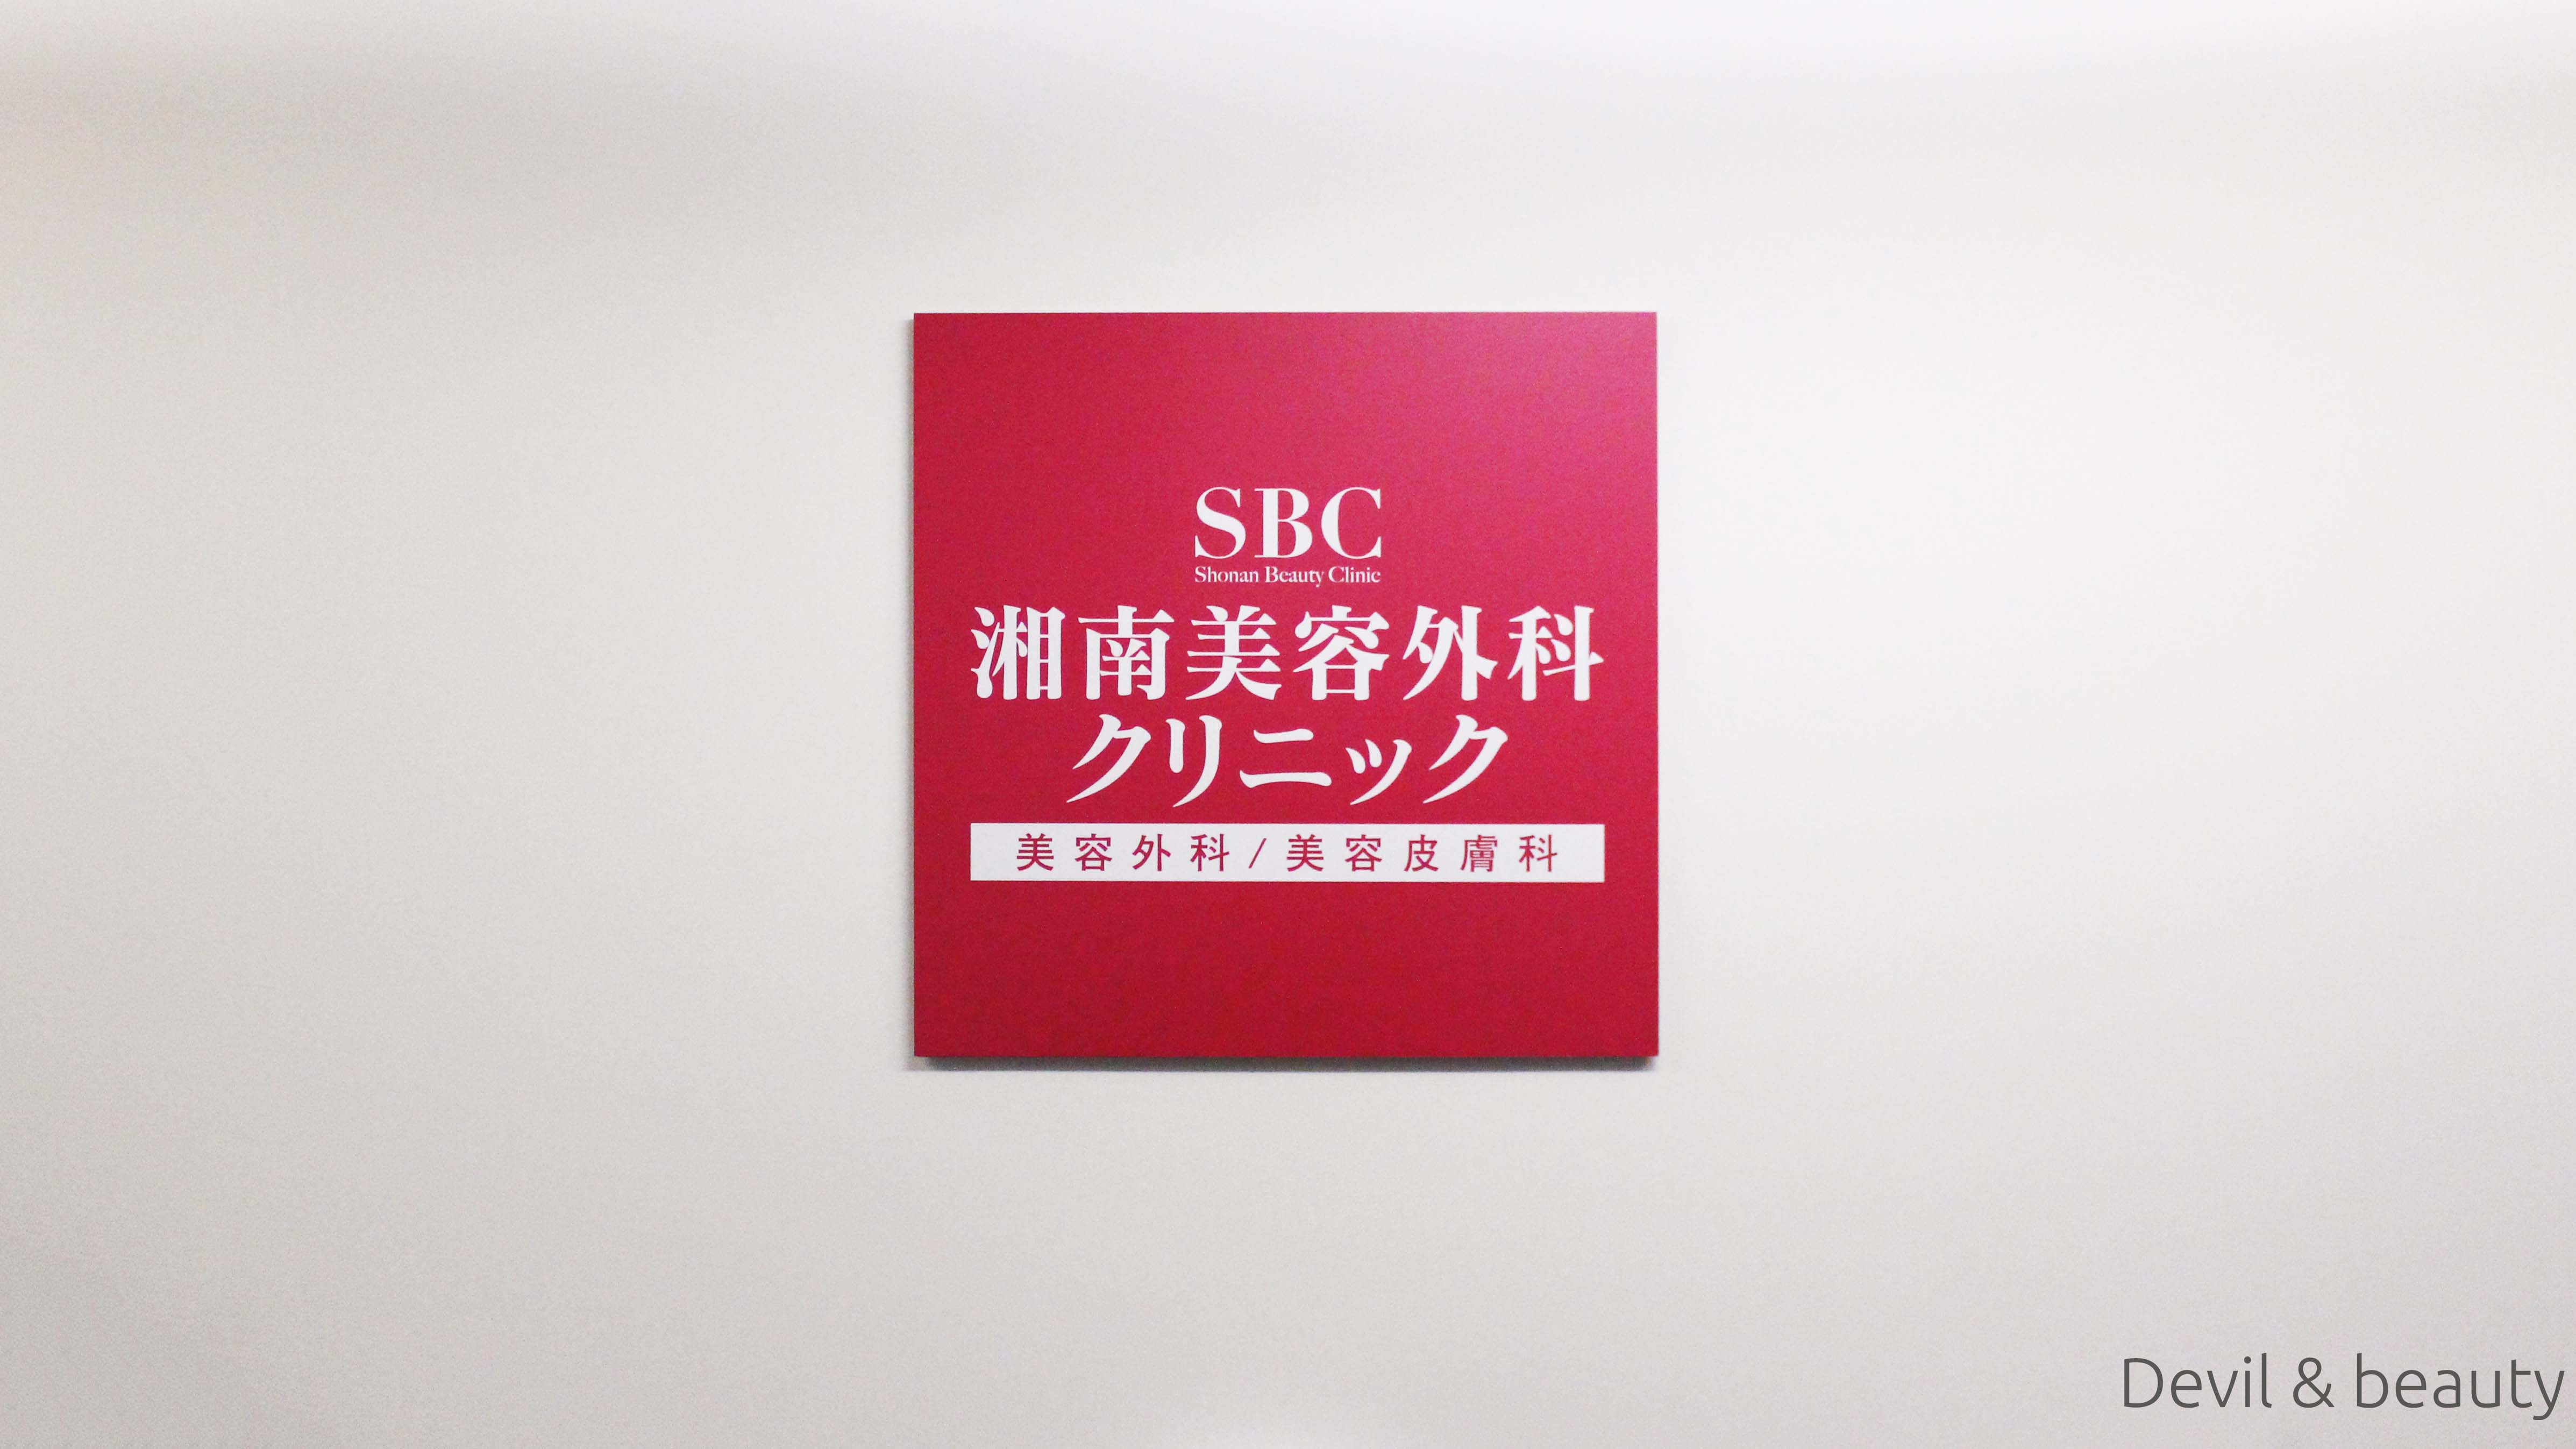 shonan-beauty-clinic-shinjuku3 - image